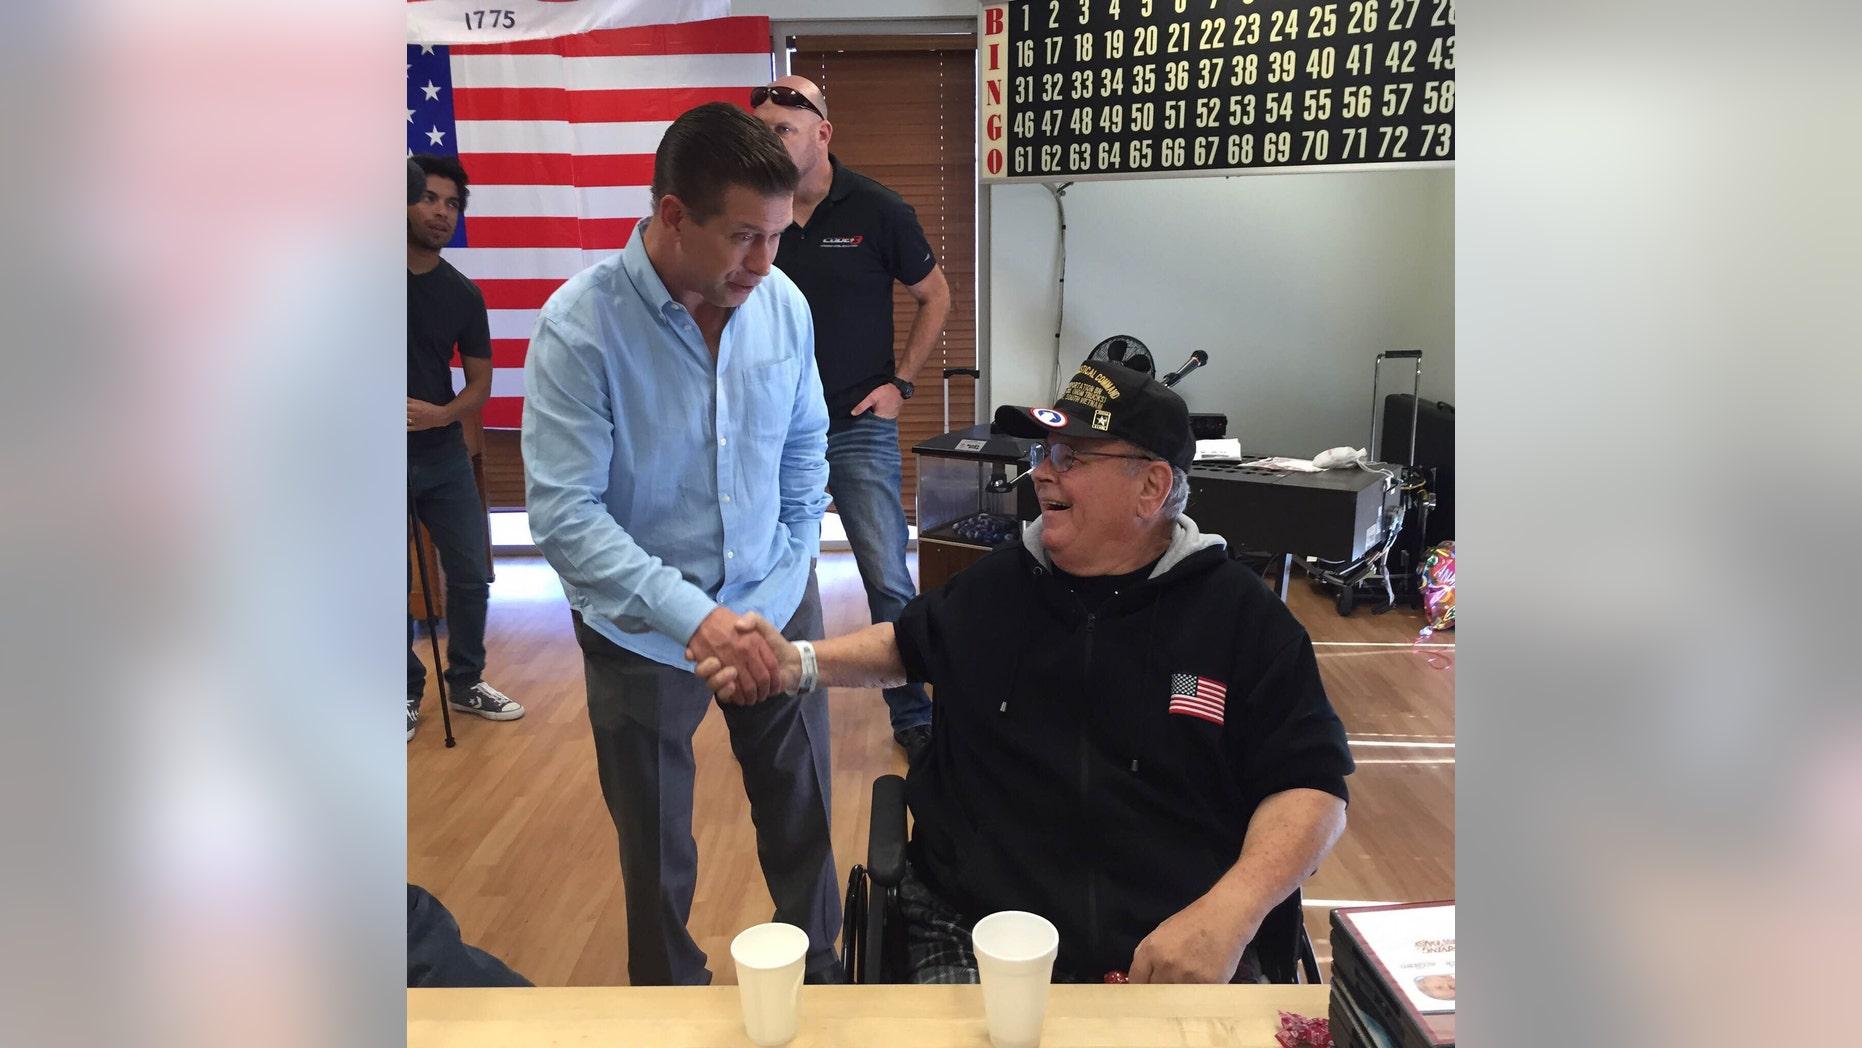 Stephen Baldwin shakes the hand of Vietnam veteran, Ronald Sumner in Fresno, Calif. at the local VA hospital. (Courtesy of the author)